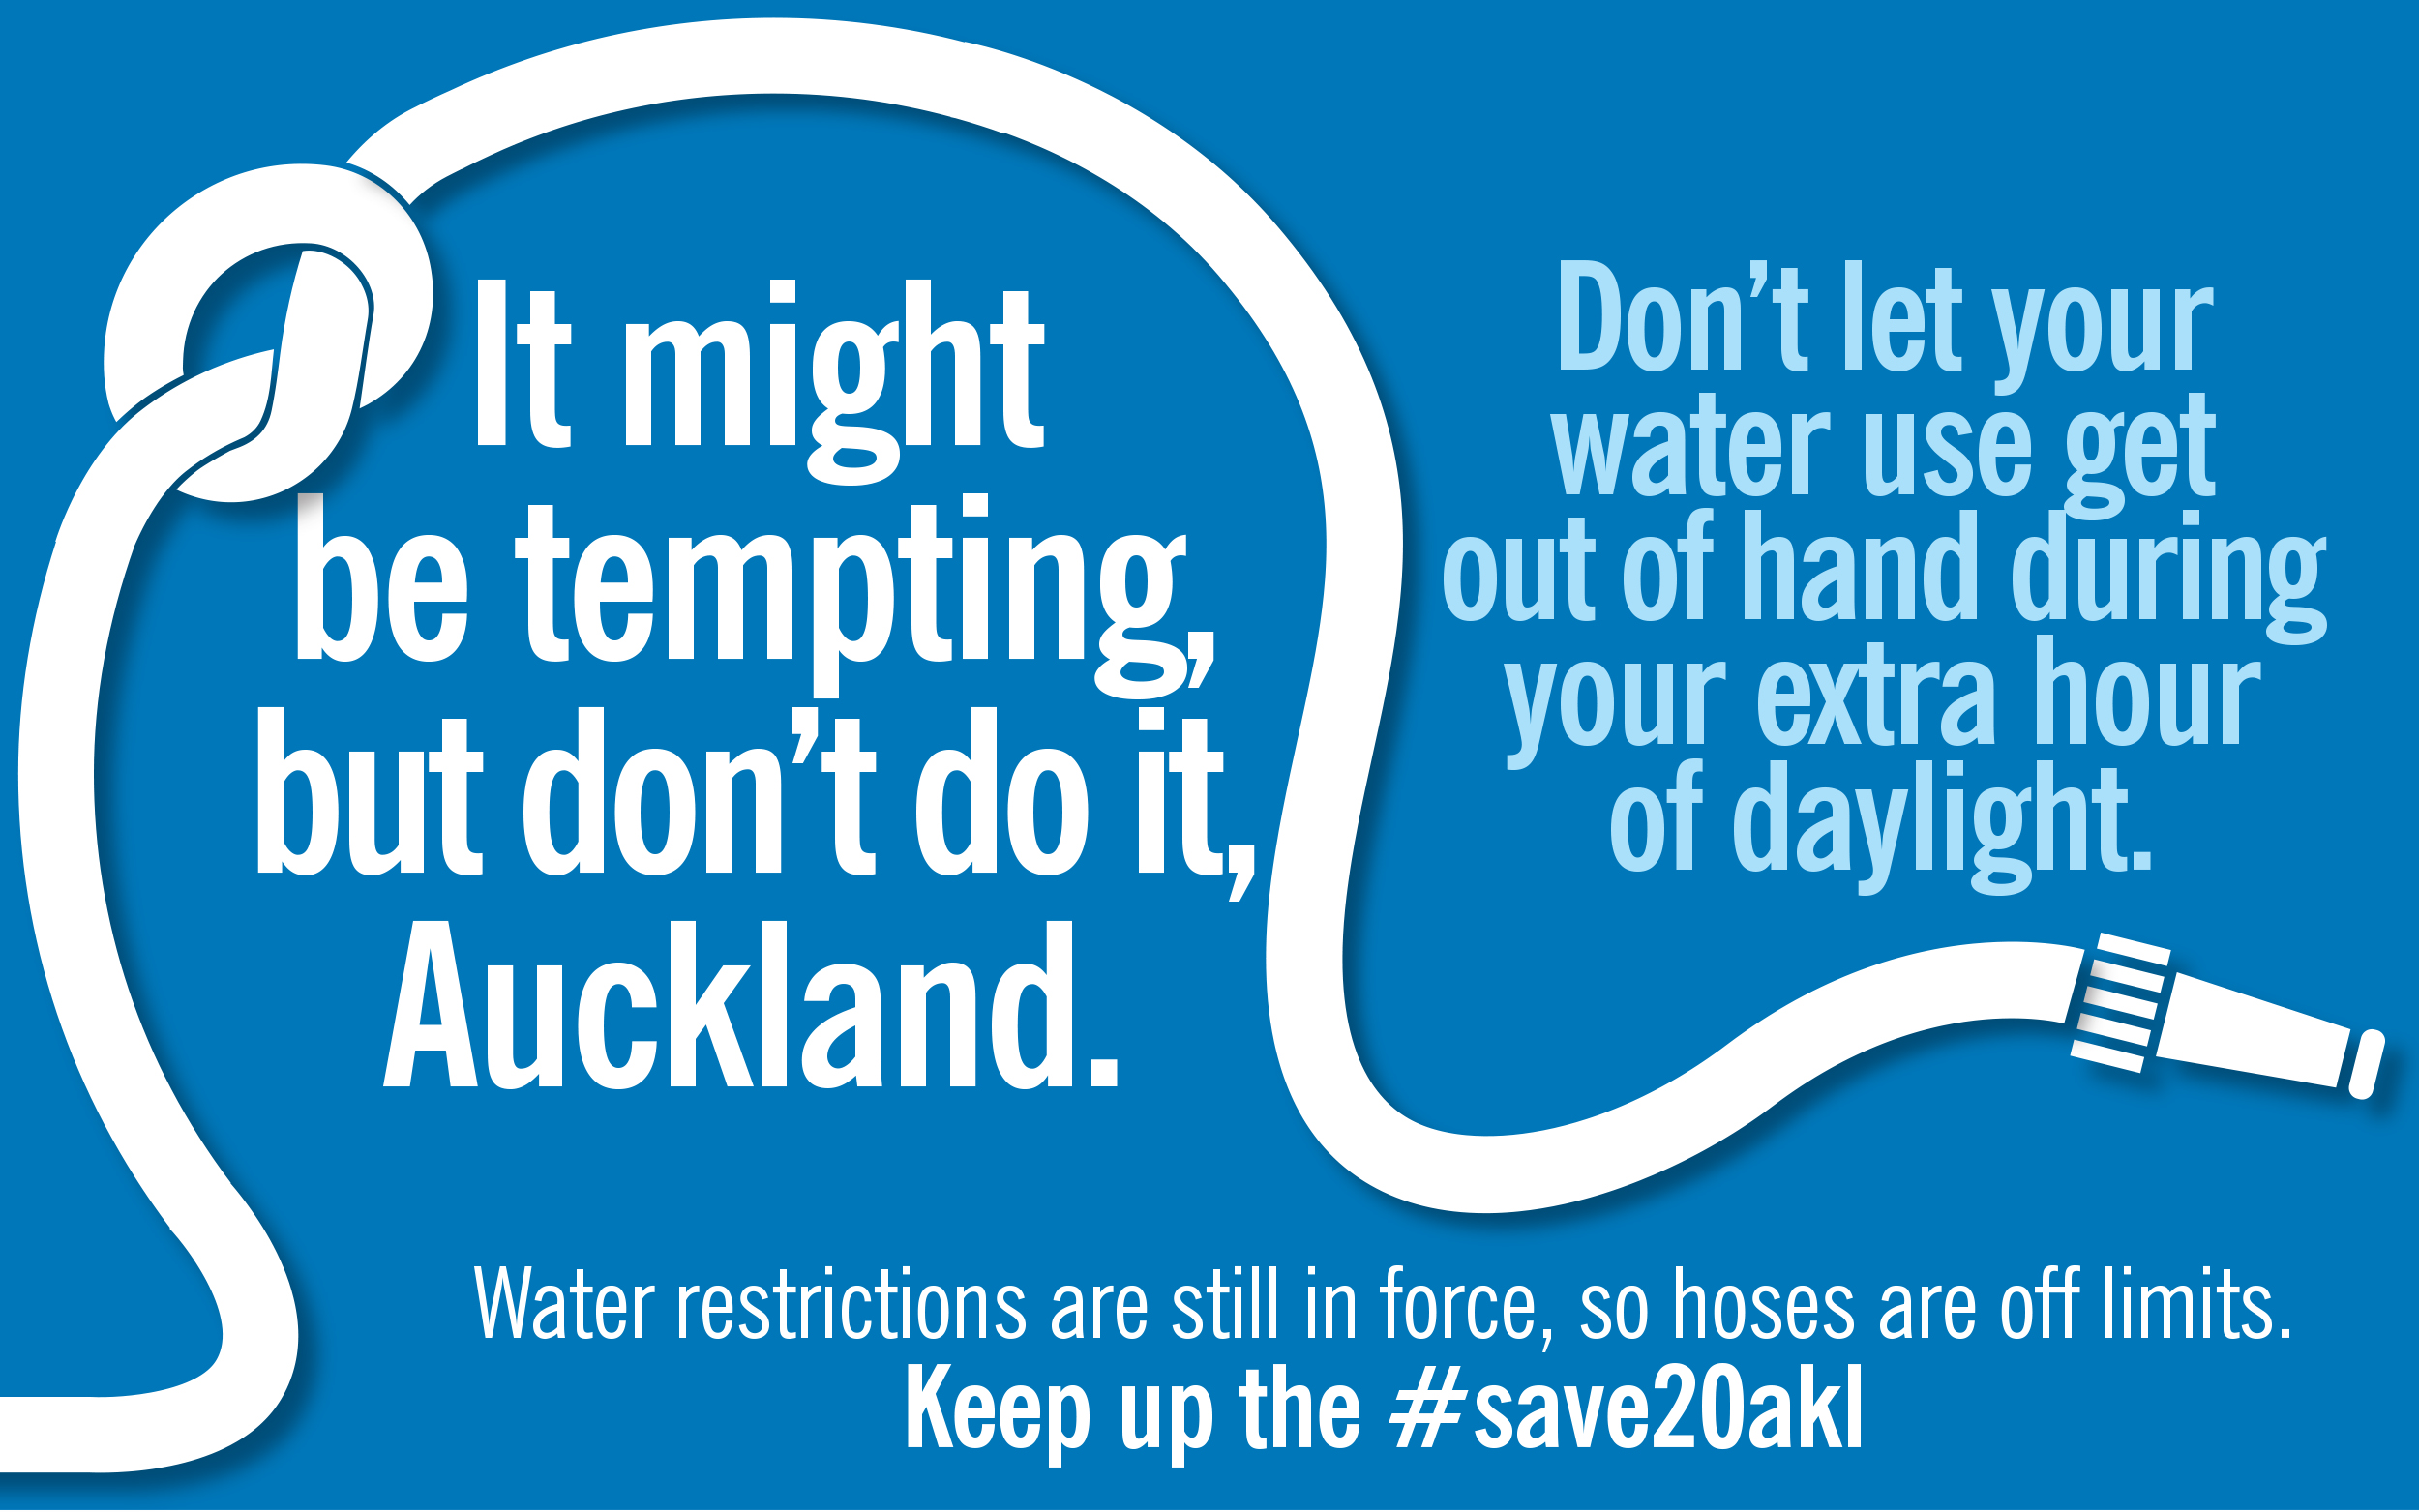 Aucklanders urged to keep saving water after daylight savings kicks in